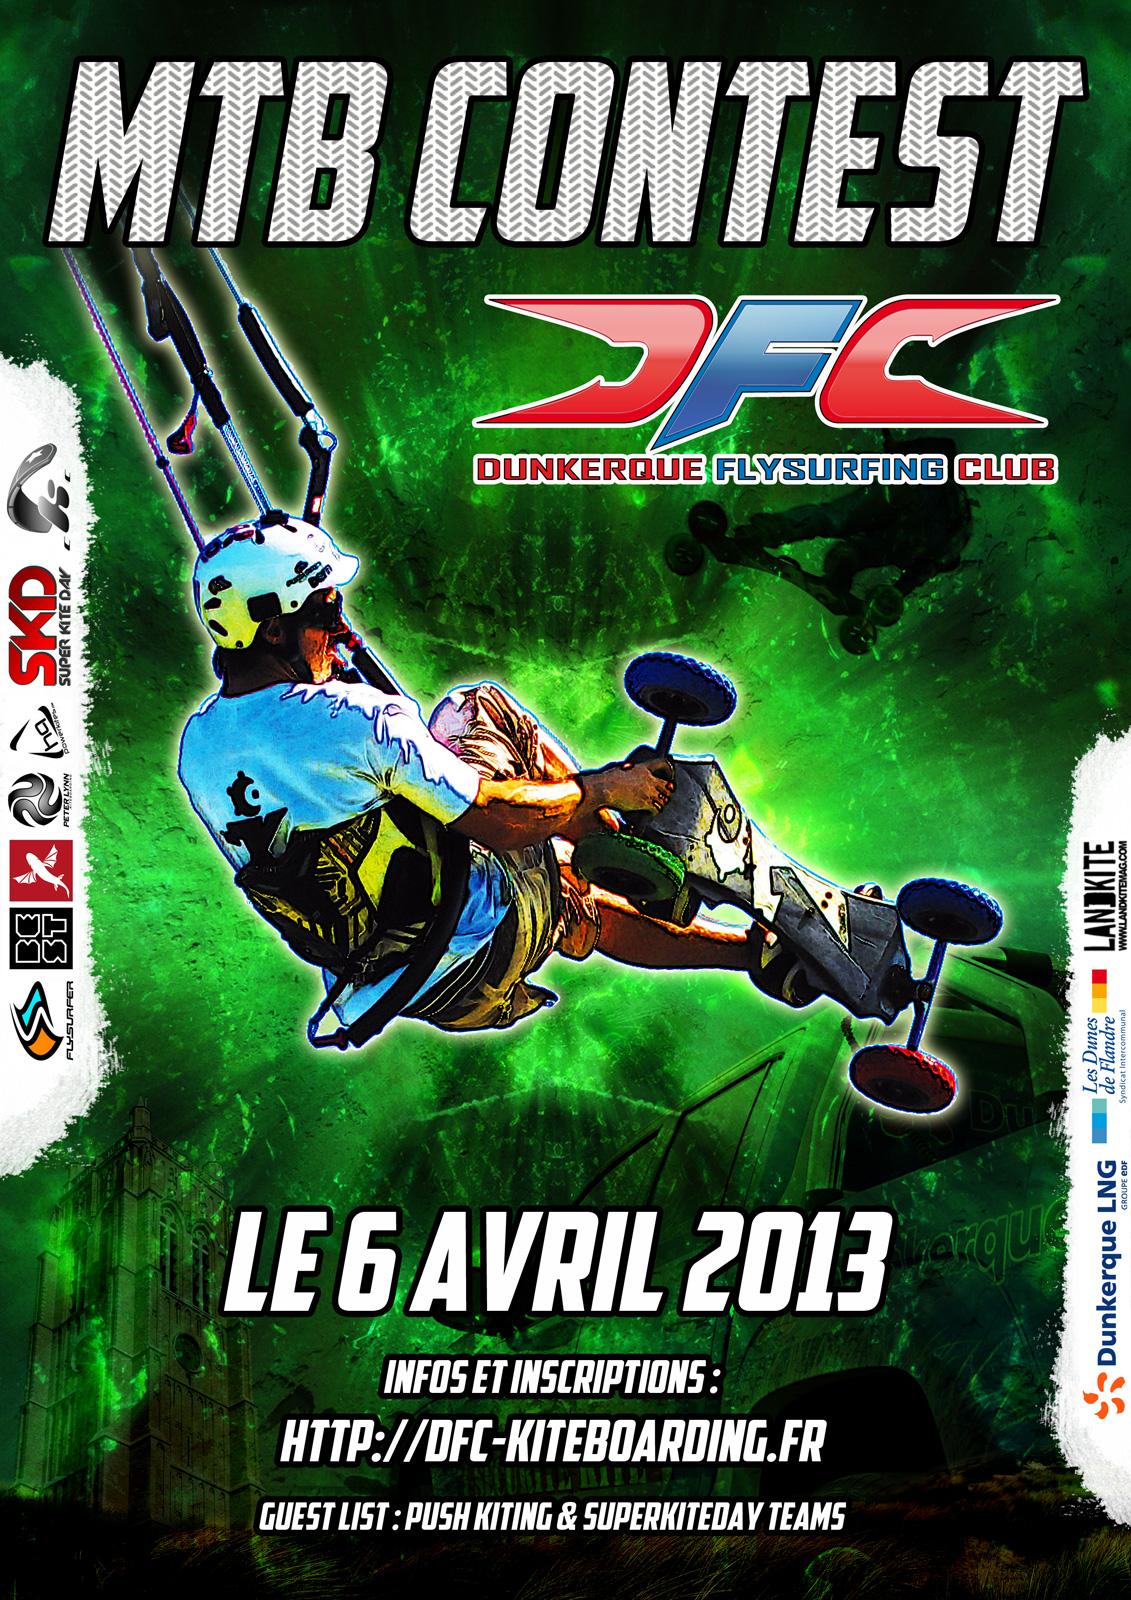 MTB Contest 2013